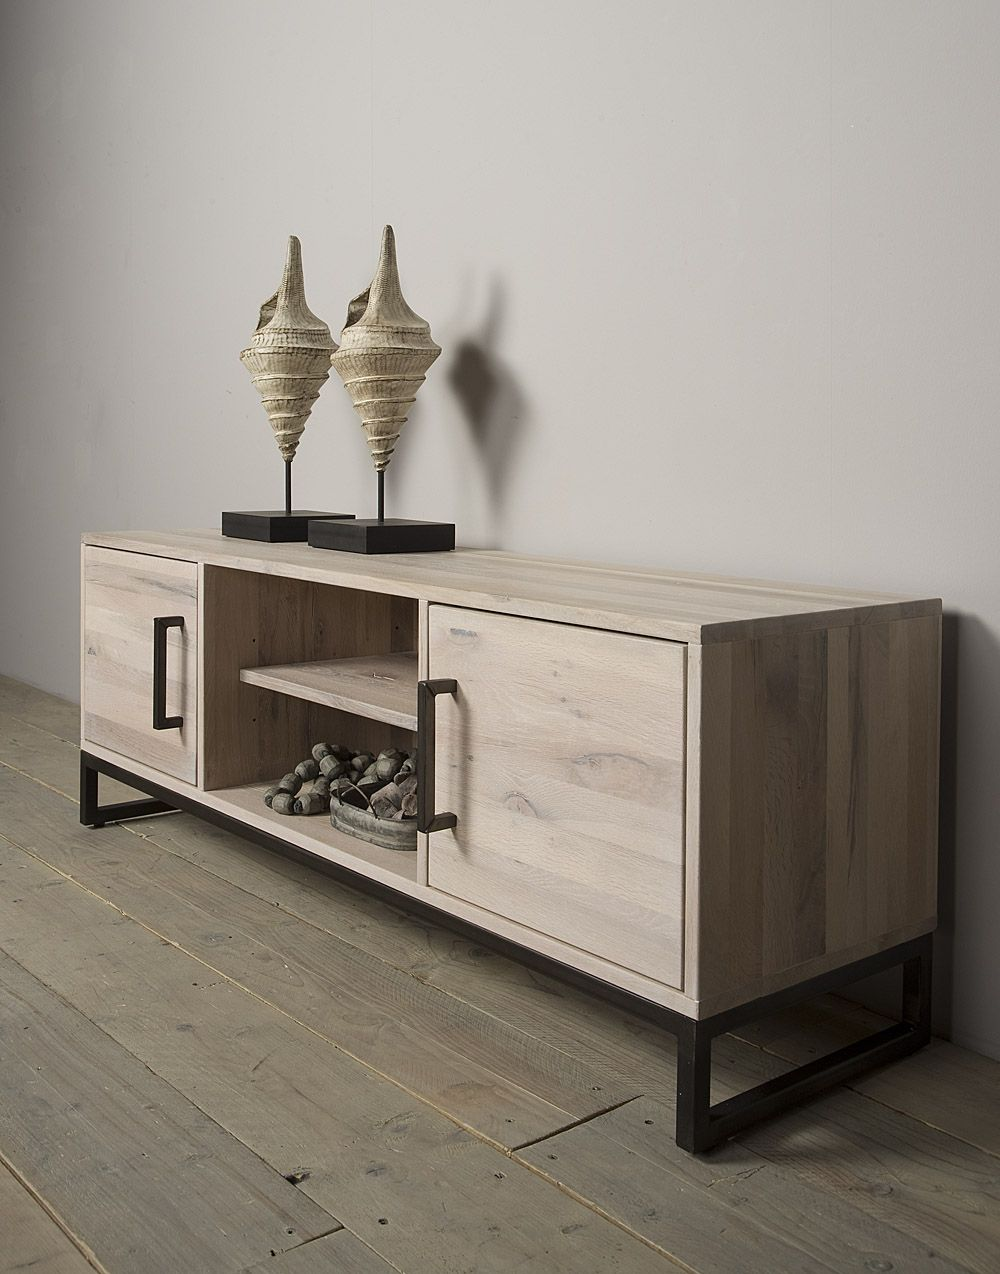 Tv Meubel 150 Cm.Lodge Tv Meubel Eikenhout Met Staal 150 Cm Furniture Decor